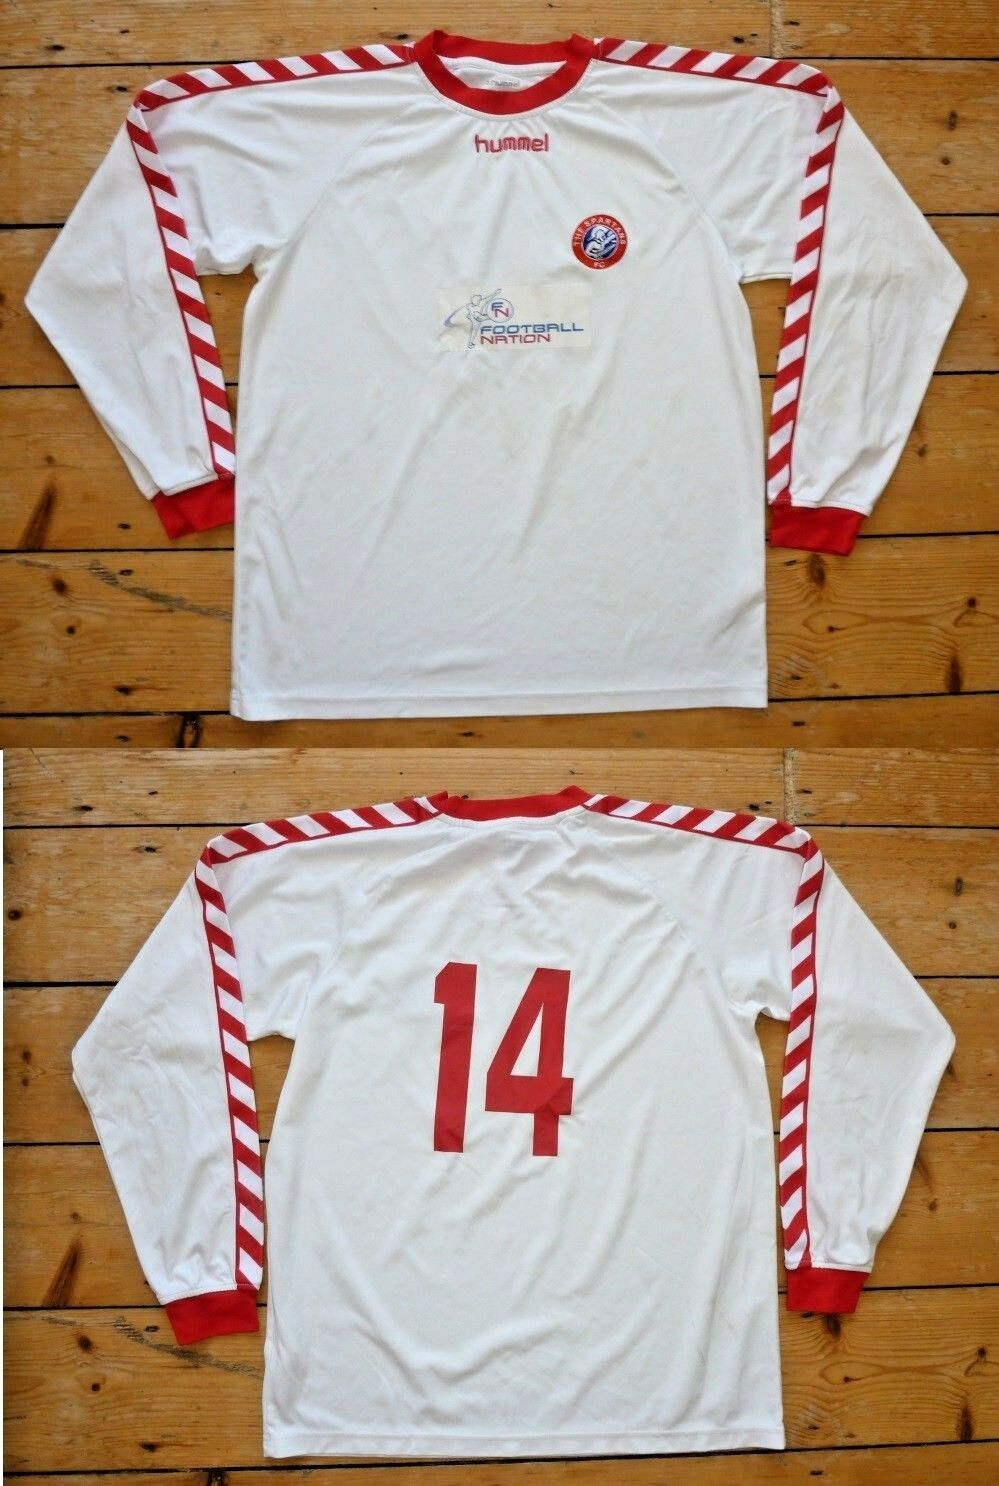 Größe: L Spartans Fußball Trikot  Fußball Shirt  Trikot 14 Matchworn Heim Trikot 4932f0